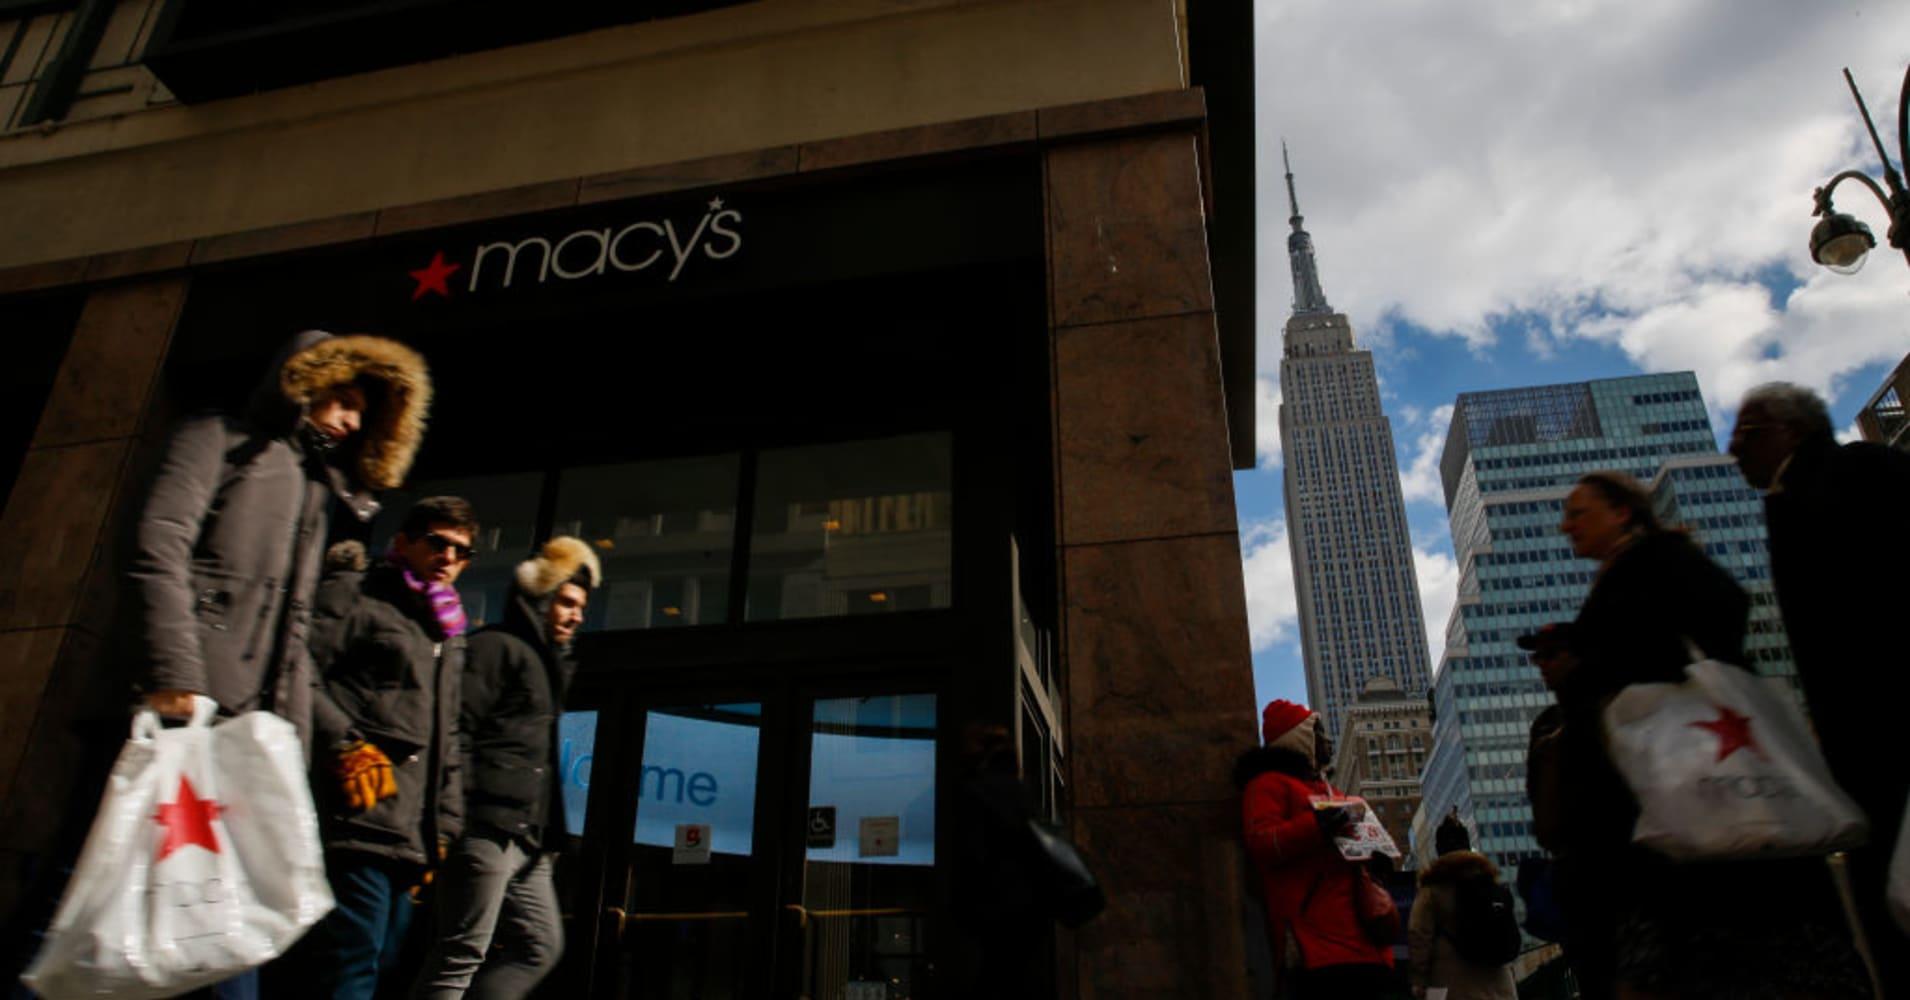 Macy's reports EPS, revenue Q4 beat despite December slowdown